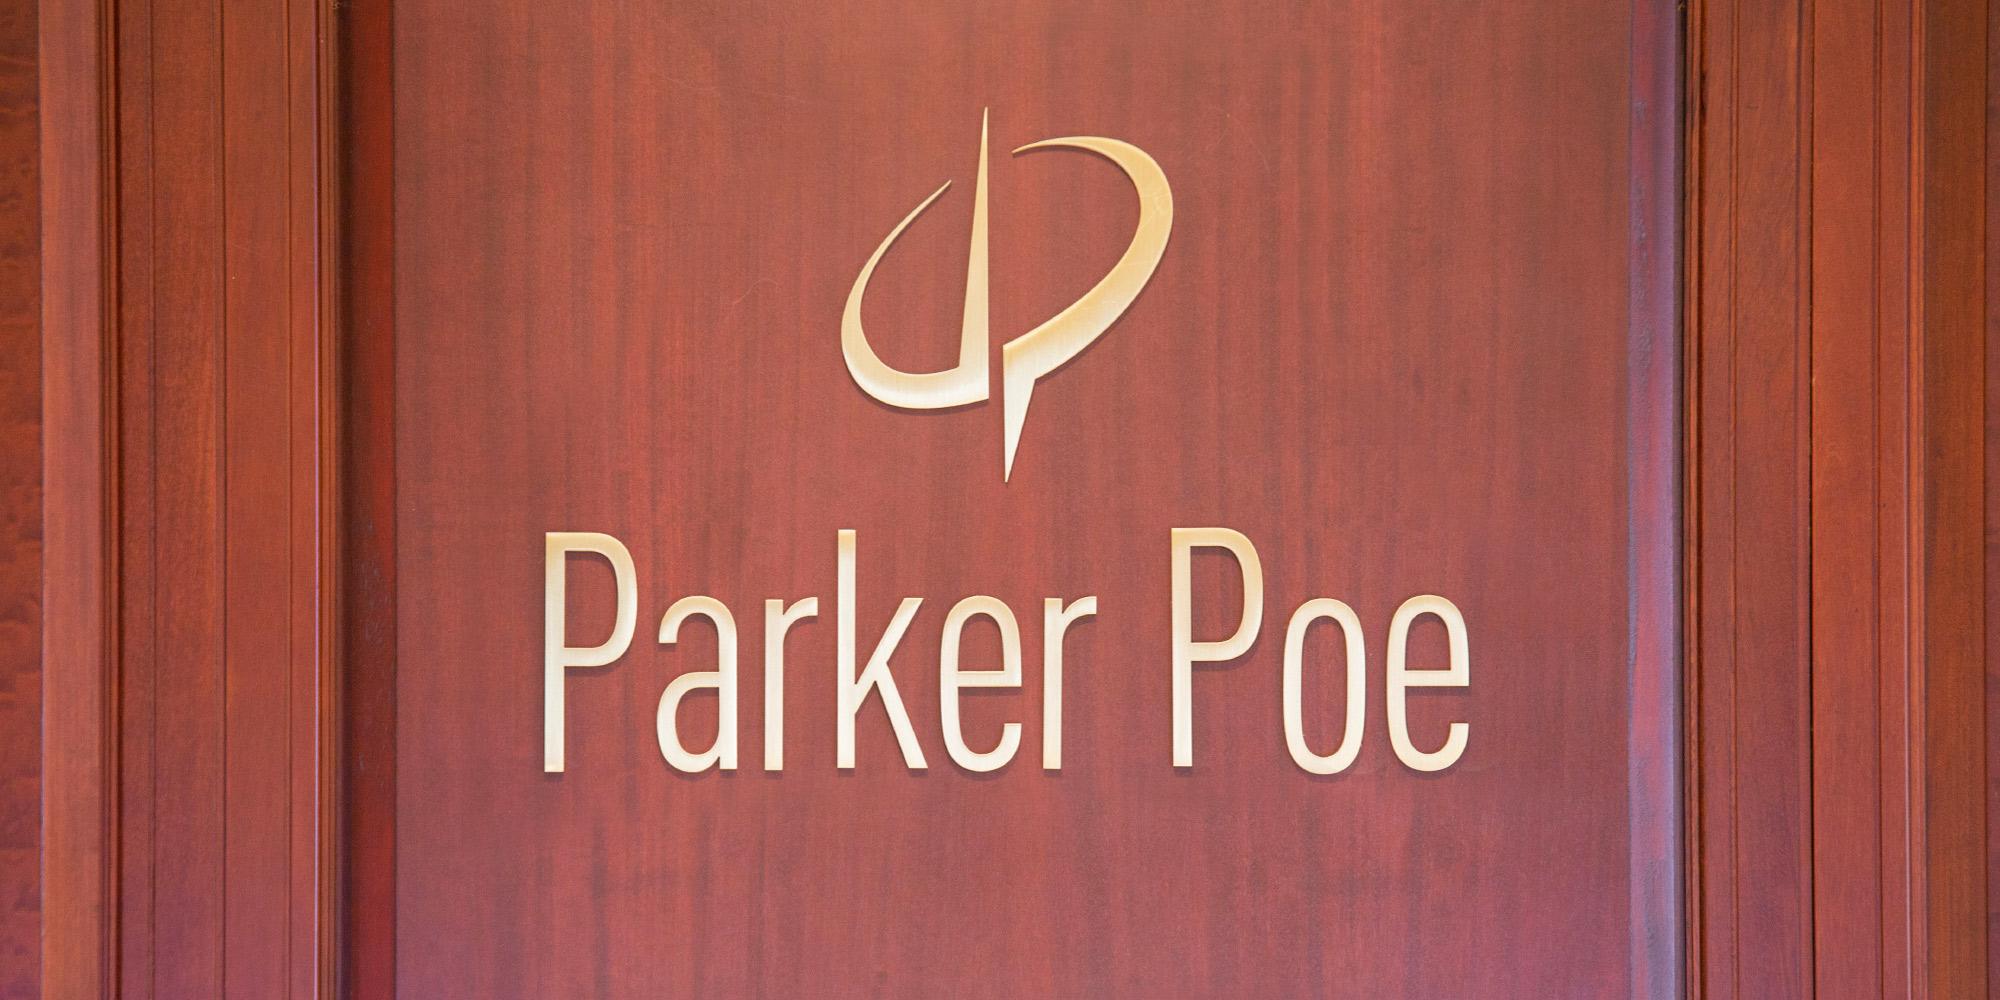 Parker Poe Lobby Signage